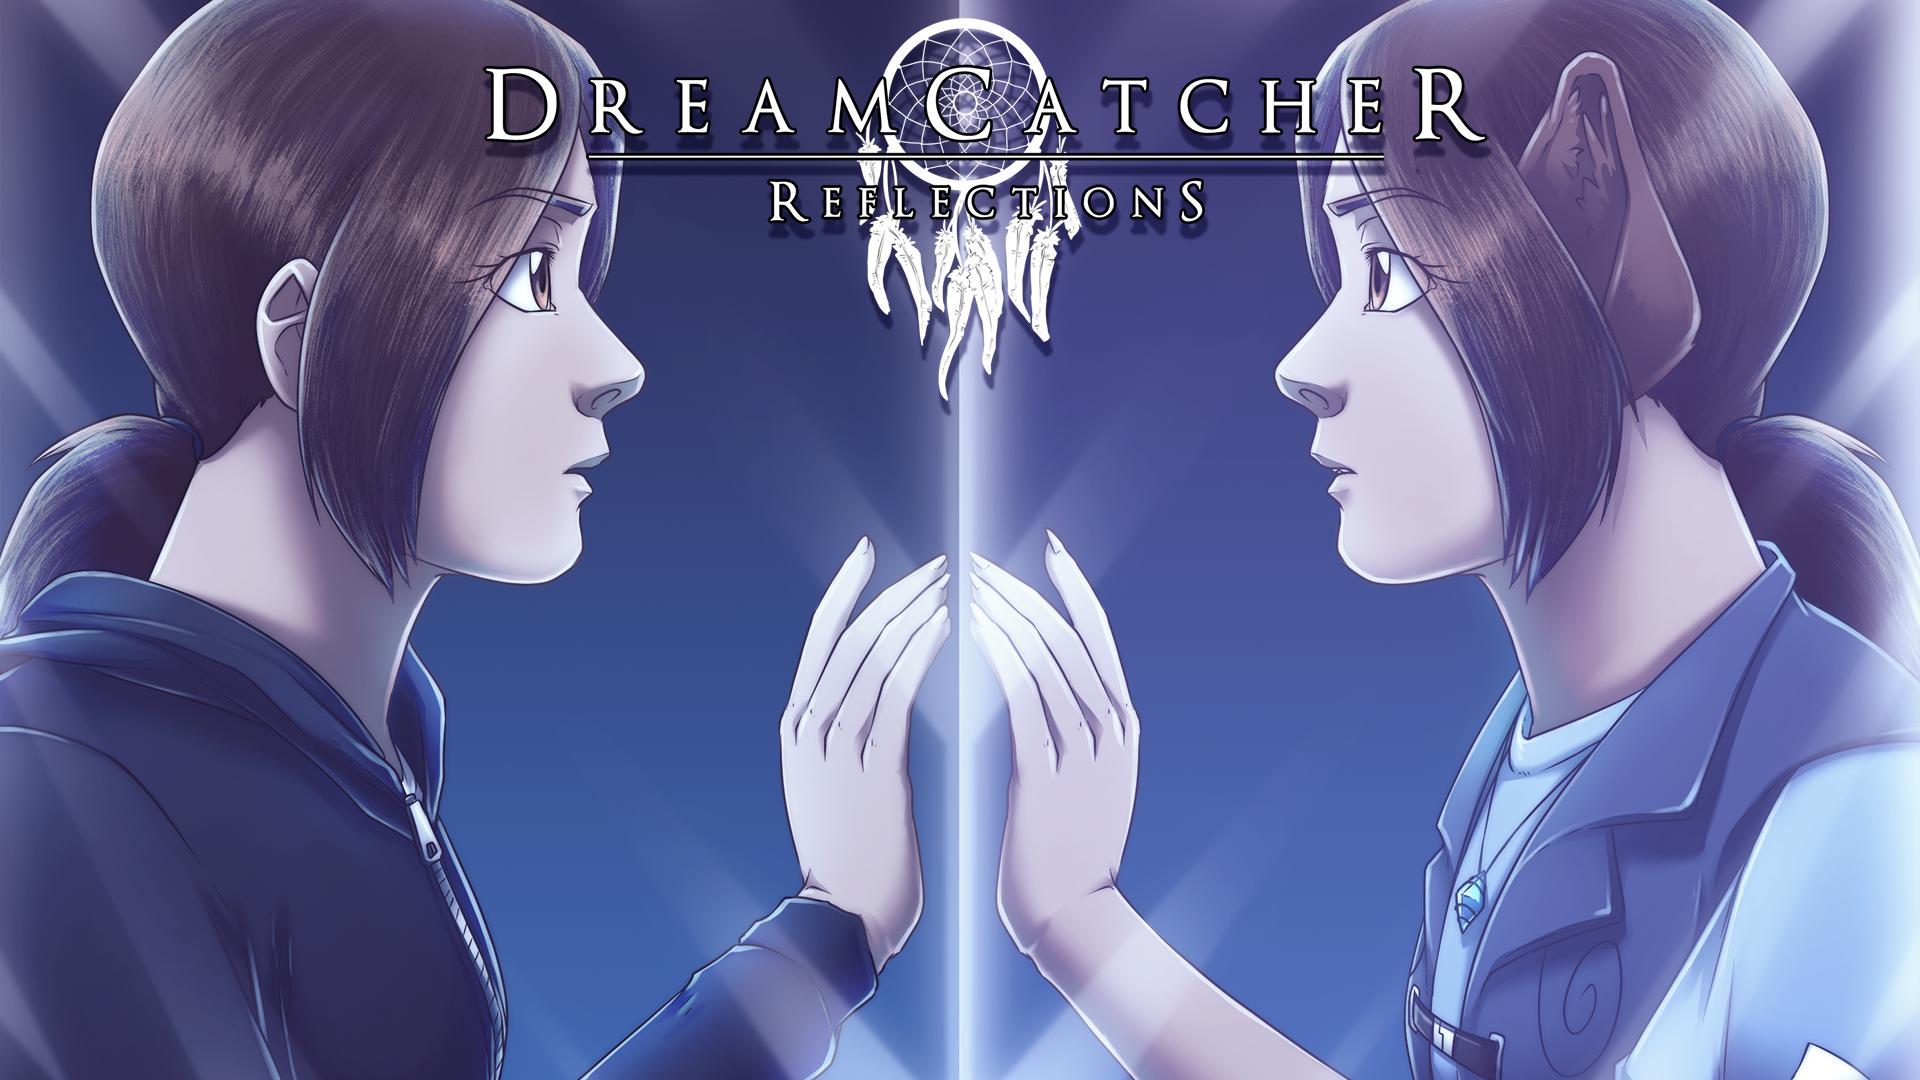 DreamCatcher: Reflections, Chapter 1